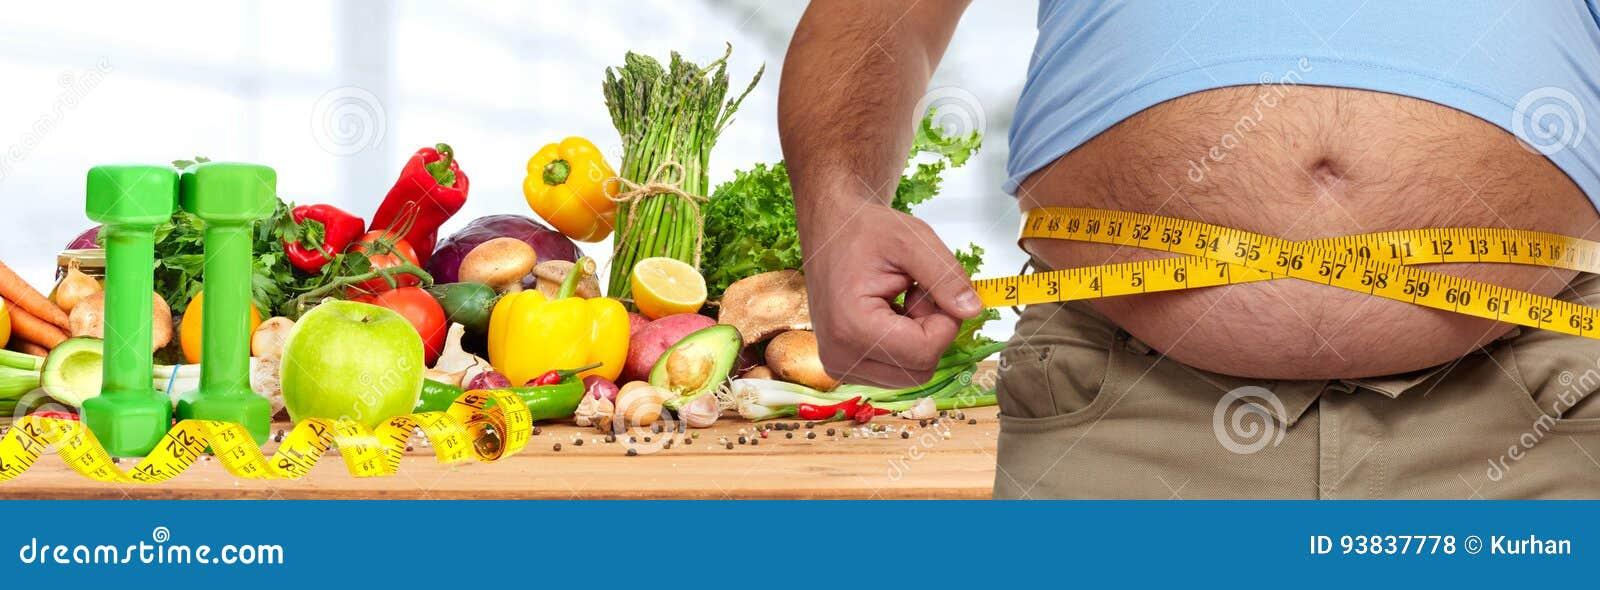 alimentos para obesos